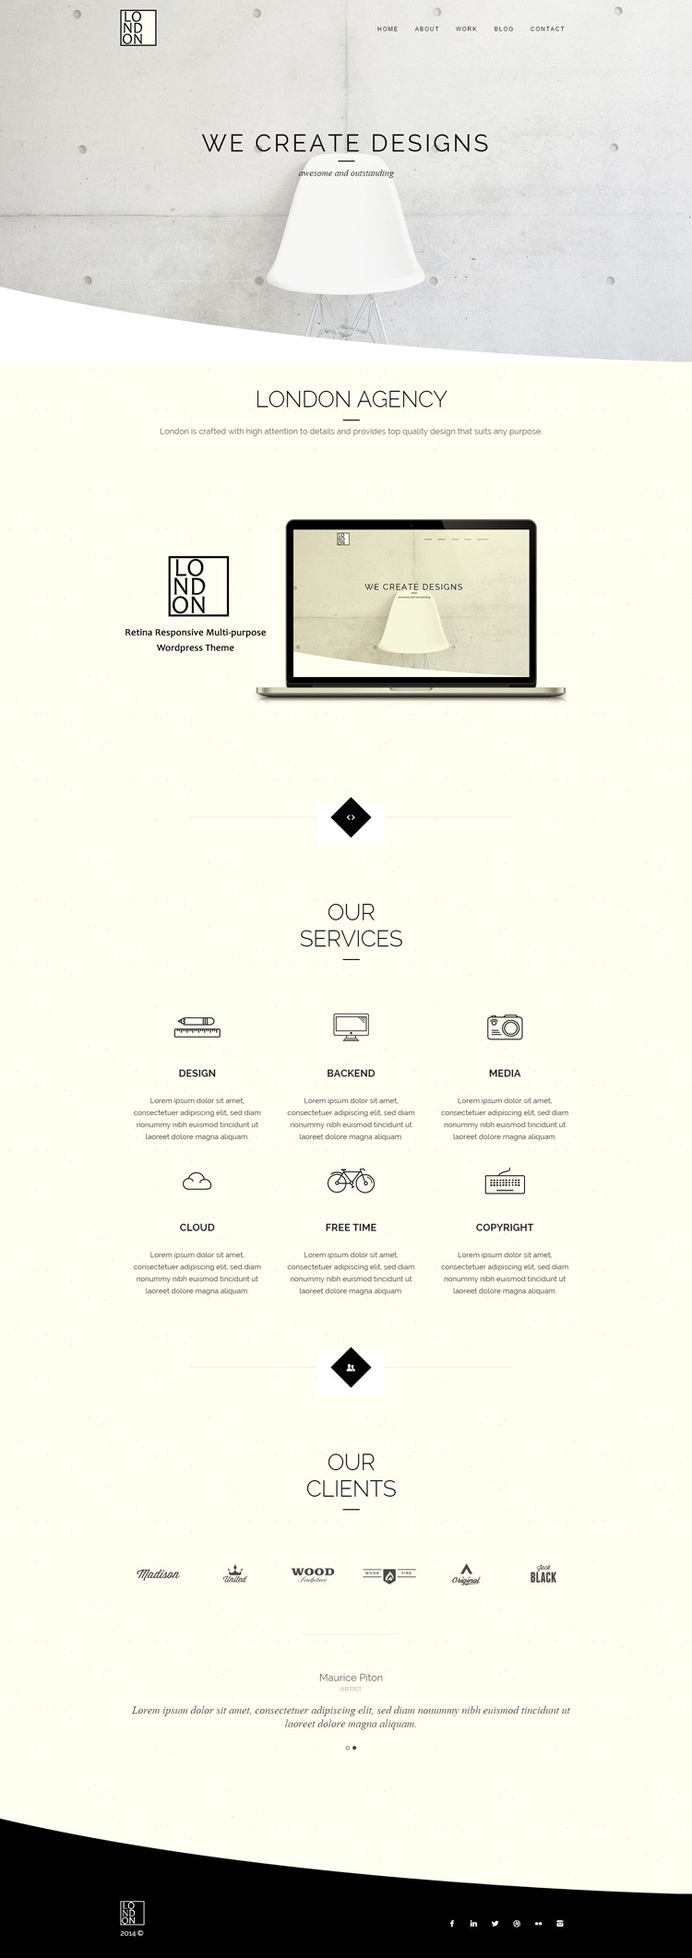 minimalist, minimal, website, concept, clean, layout #minimalist #minimal #website #concept #clean #layout